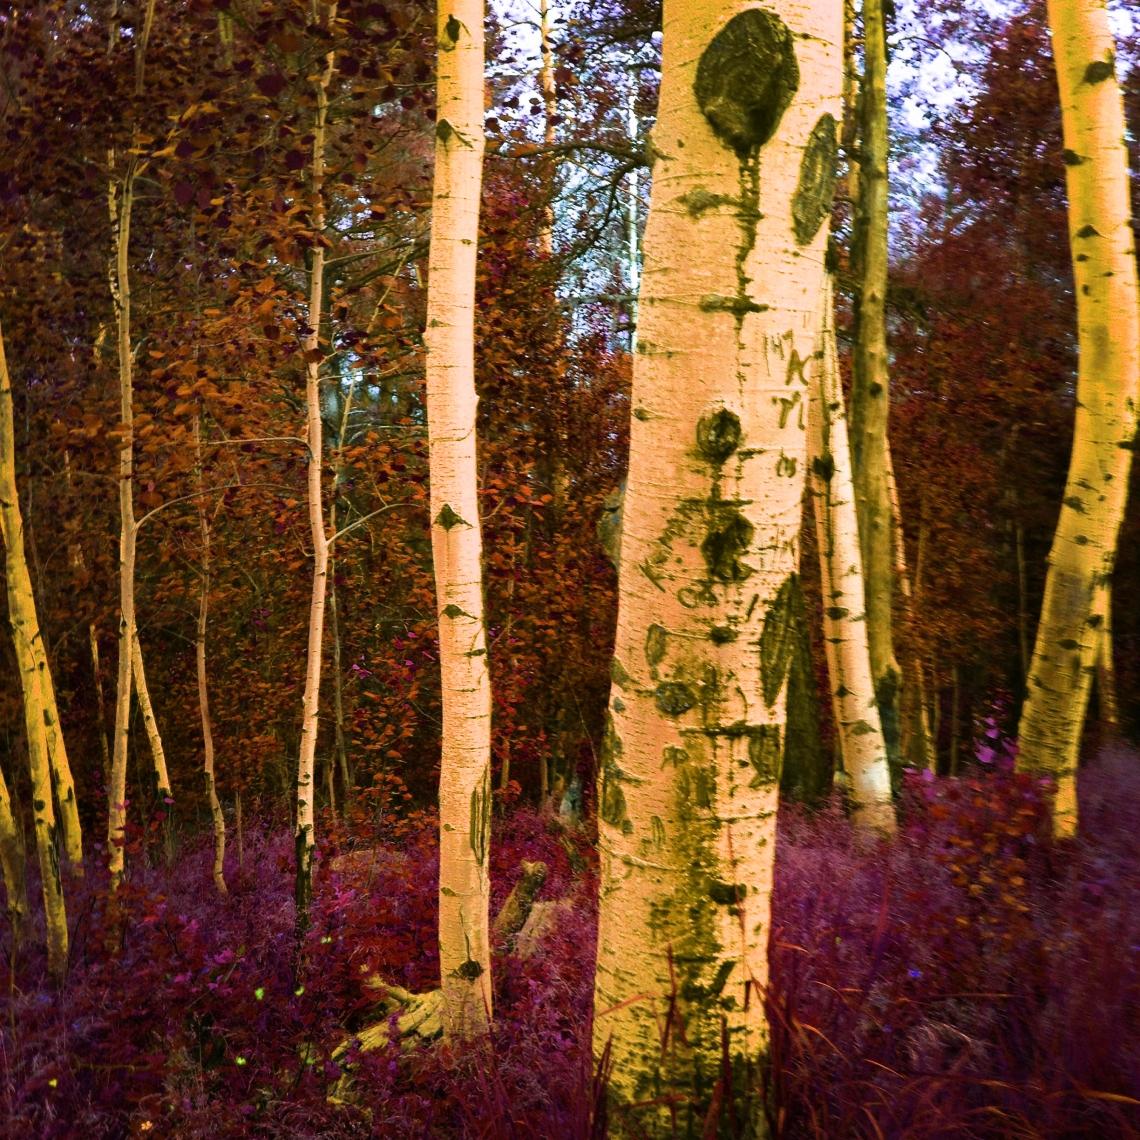 Psychedelic Aspen - Photography © 2015 Holly Troy